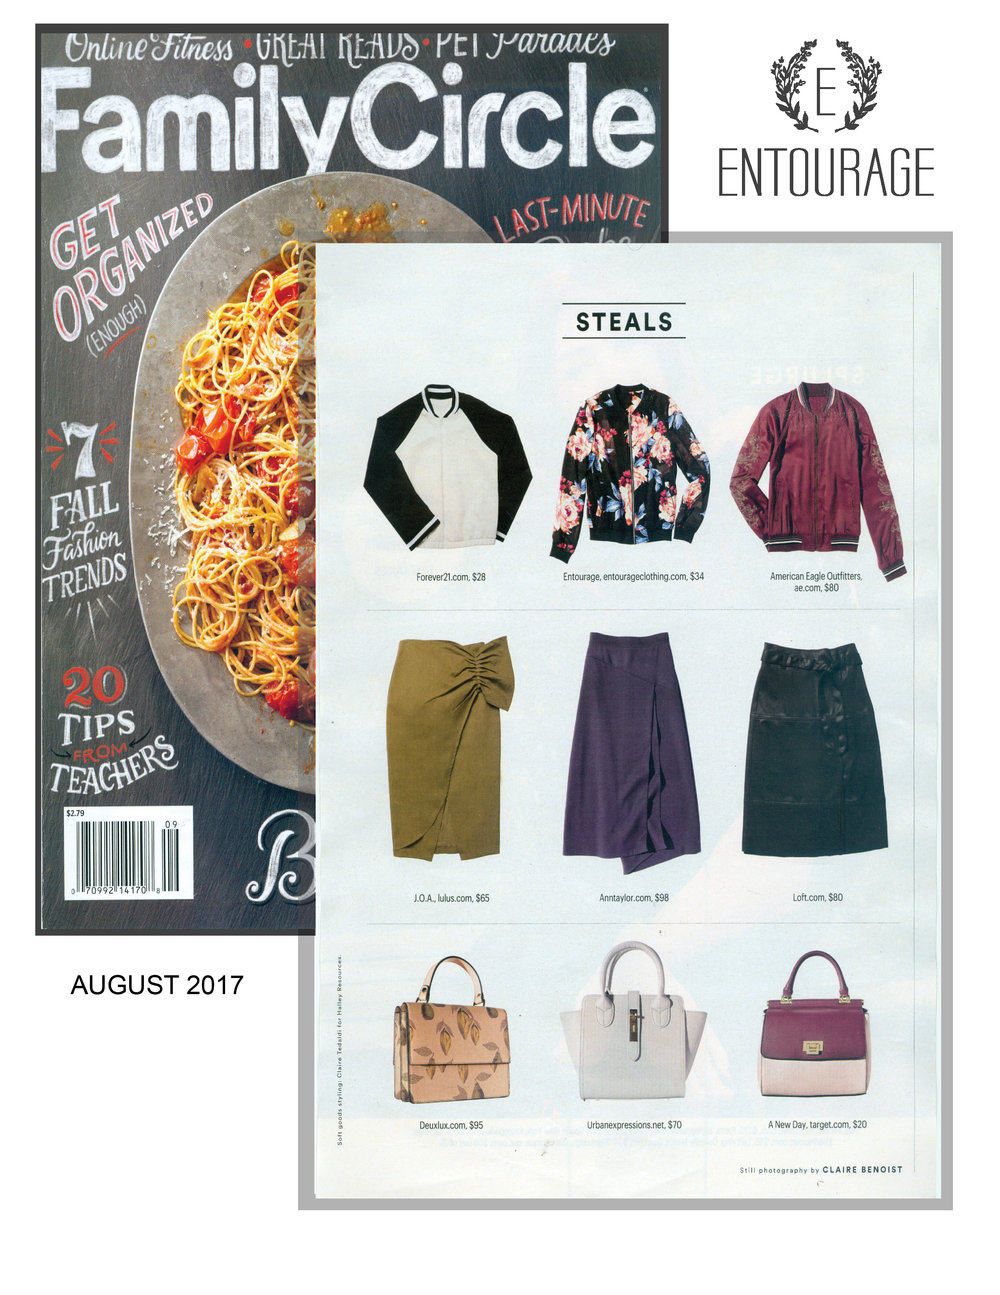 Entourage_FamilyCircle_August2017.jpg